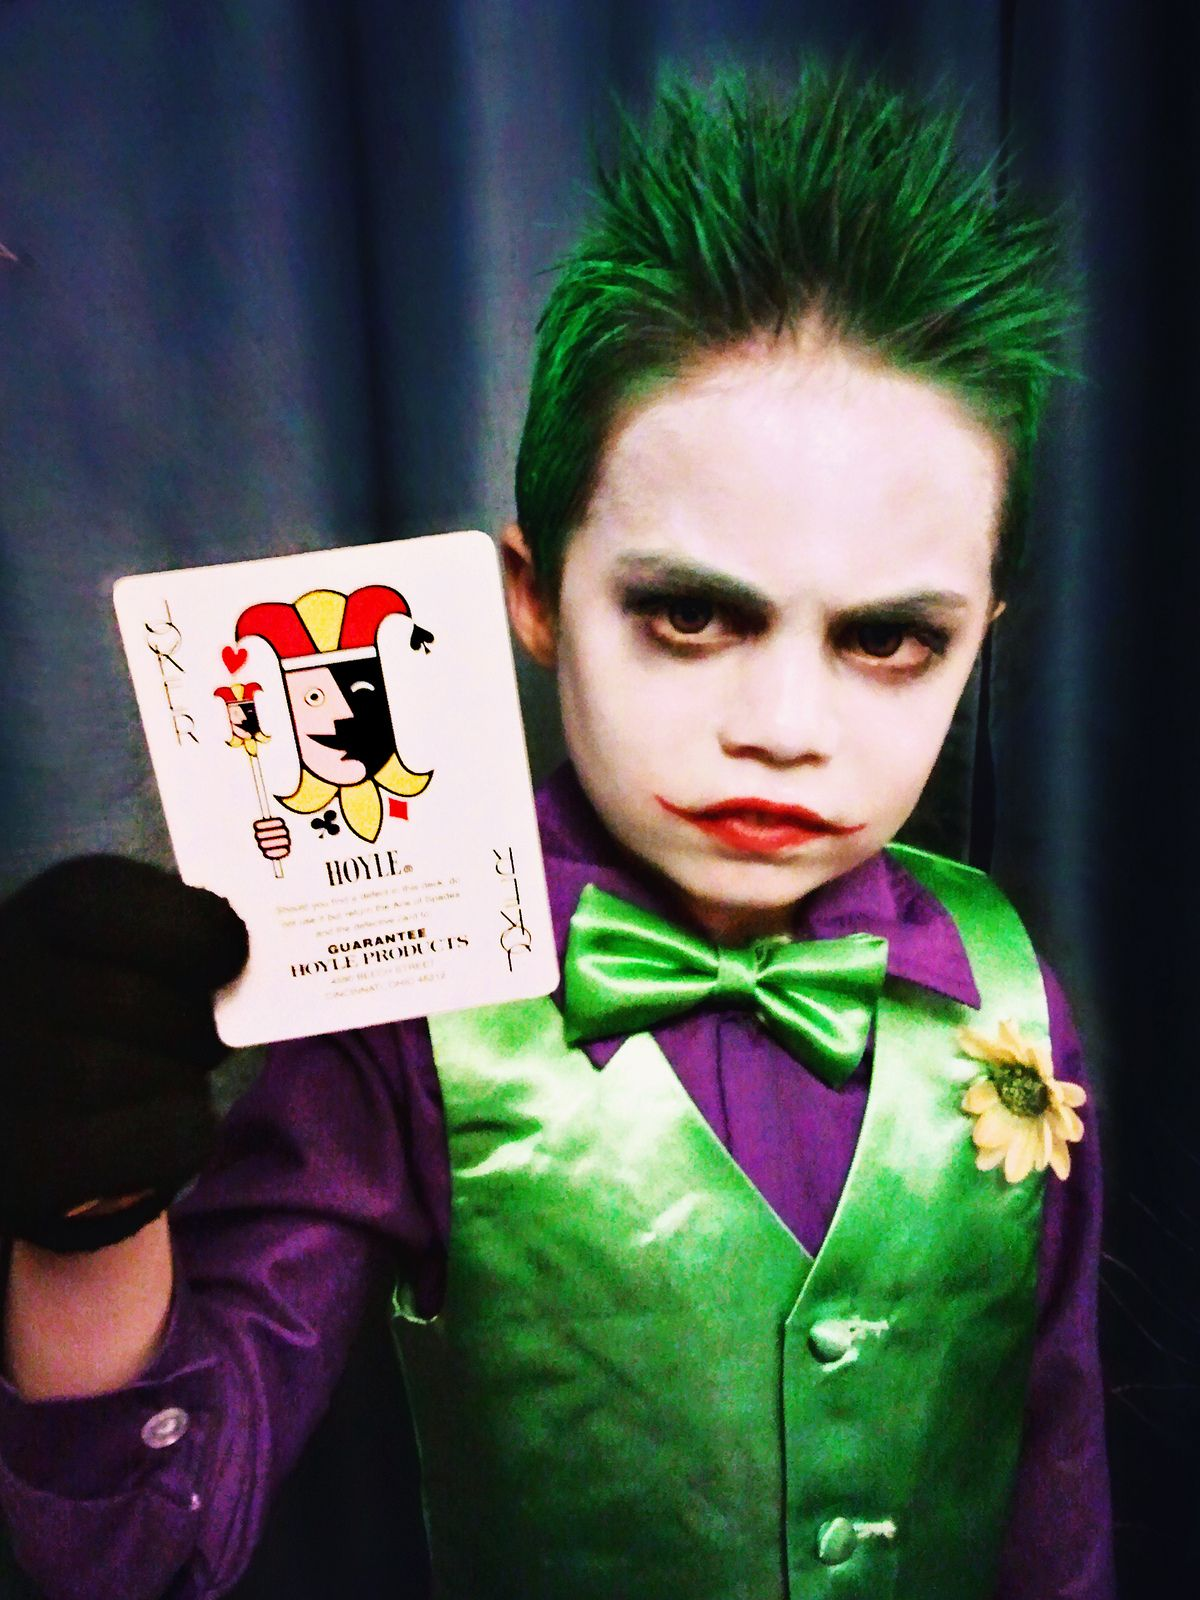 Halloween Joker Card.Joker Card Halloween Joker Halloween Joker Costume Joker